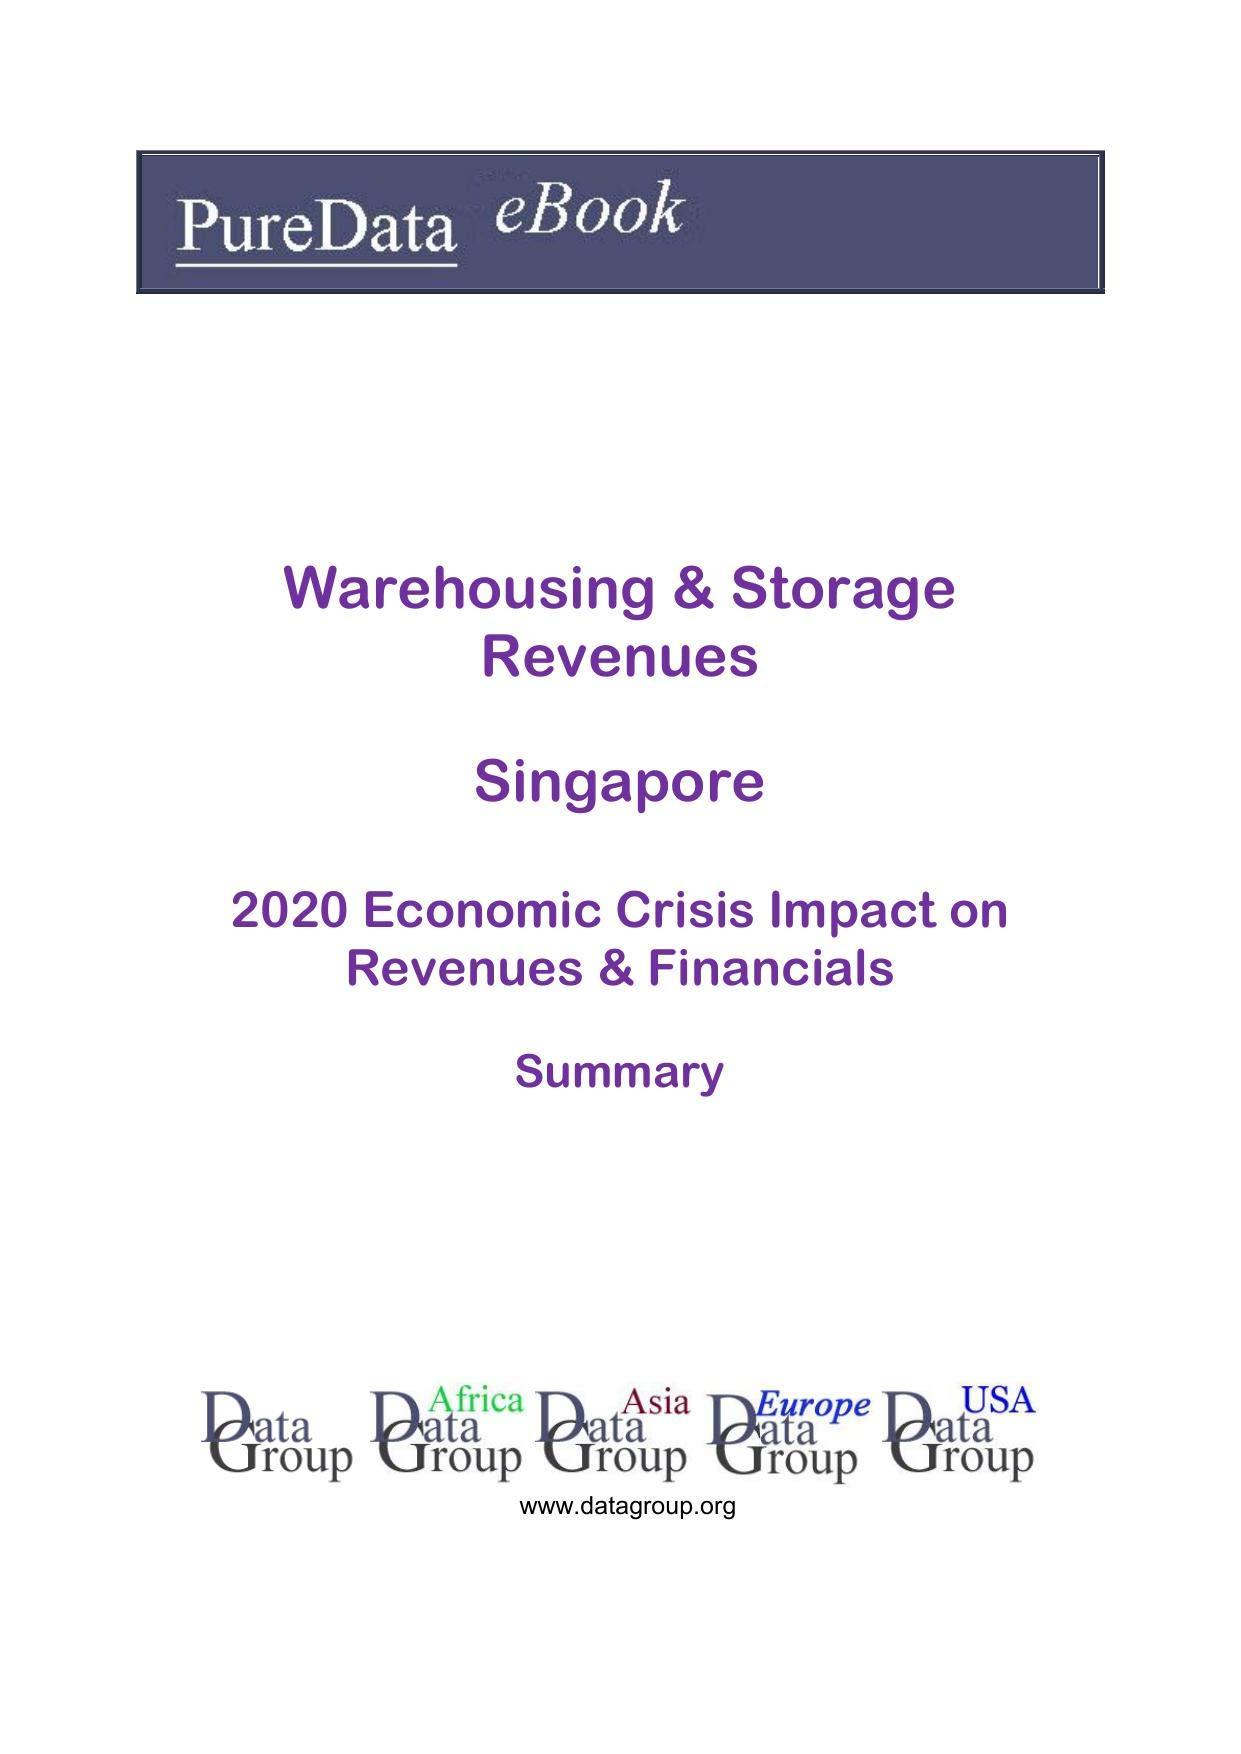 Warehousing & Storage Revenues Singapore Summary: 2020 Economic Crisis Impact on Revenues & Financials